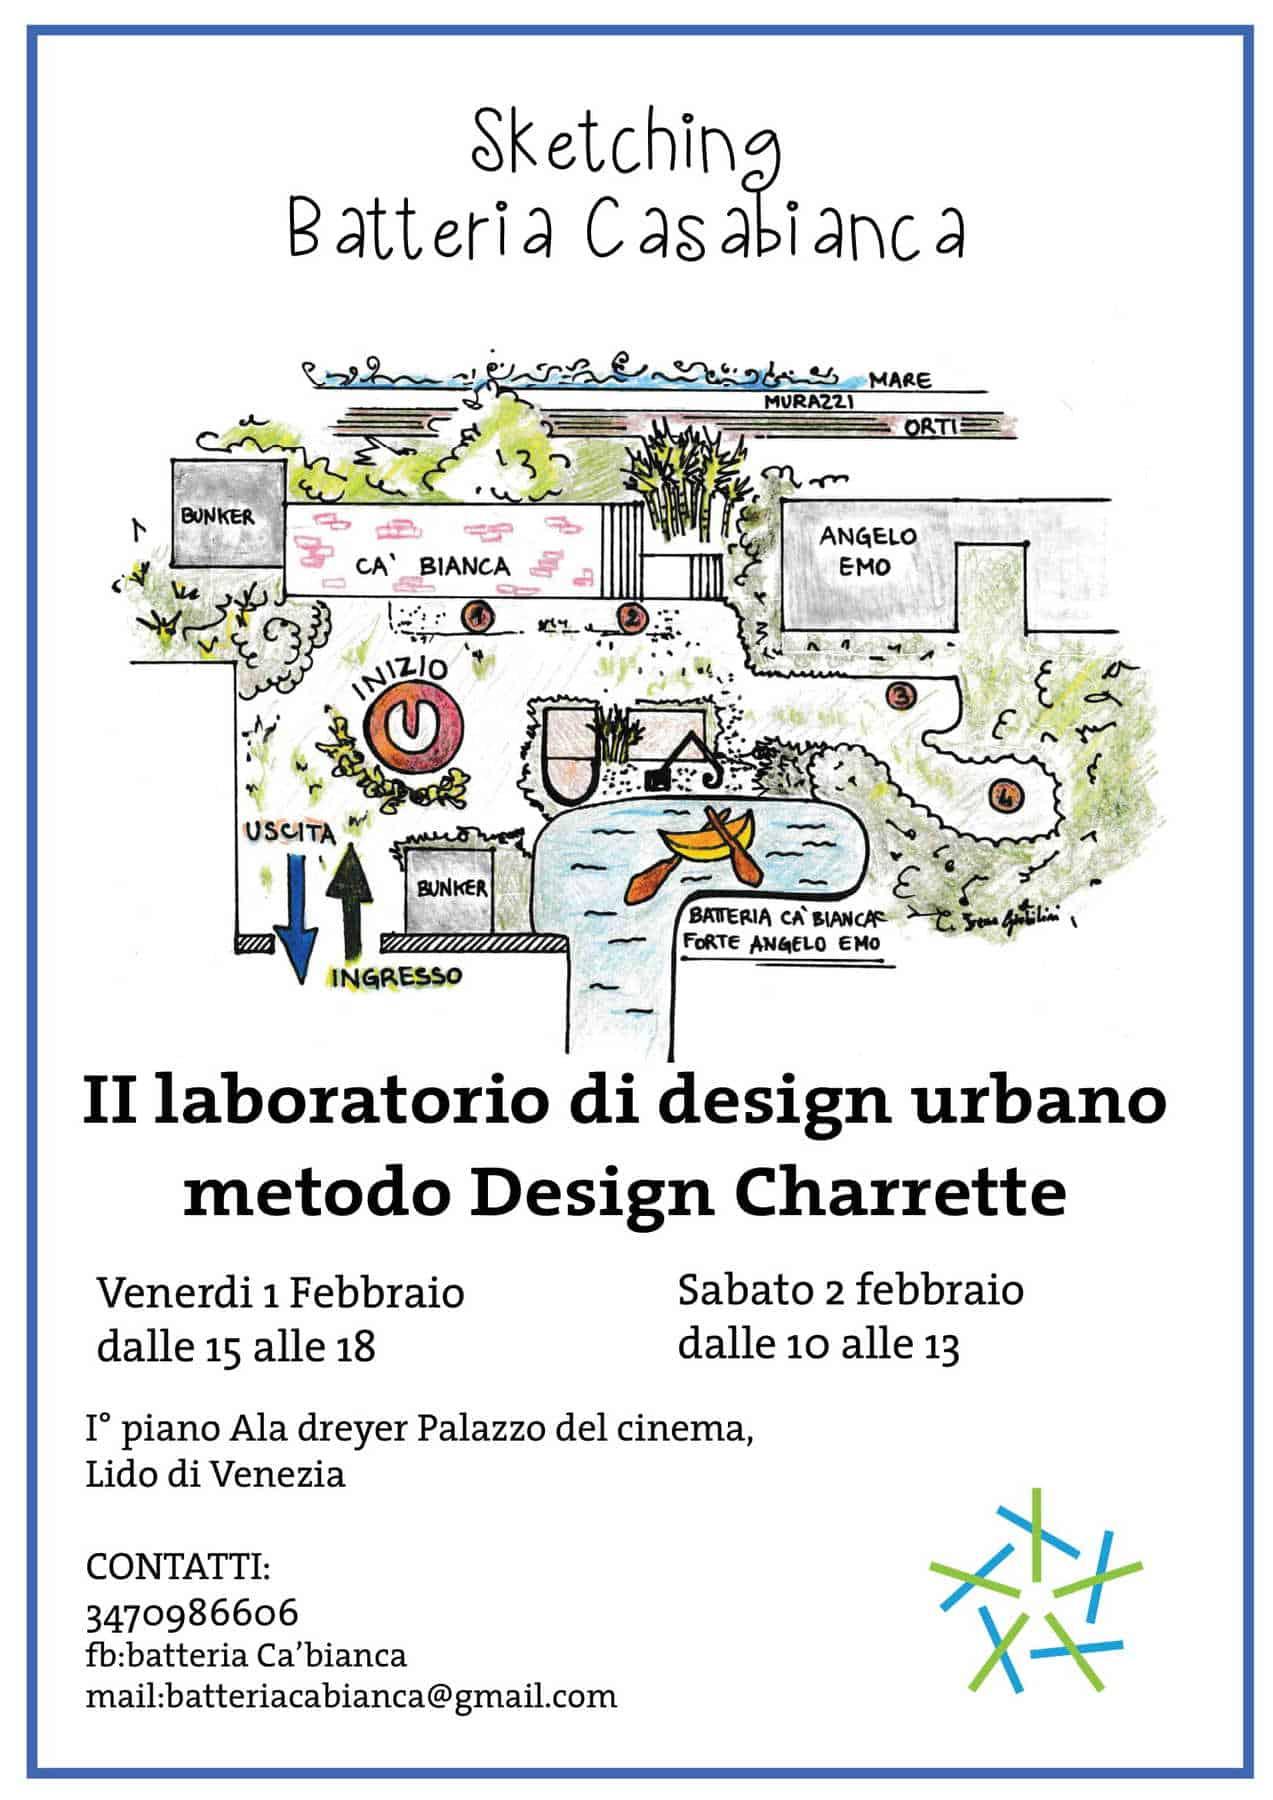 Sketching Batteria Casabianca: II laboratorio di design urbano